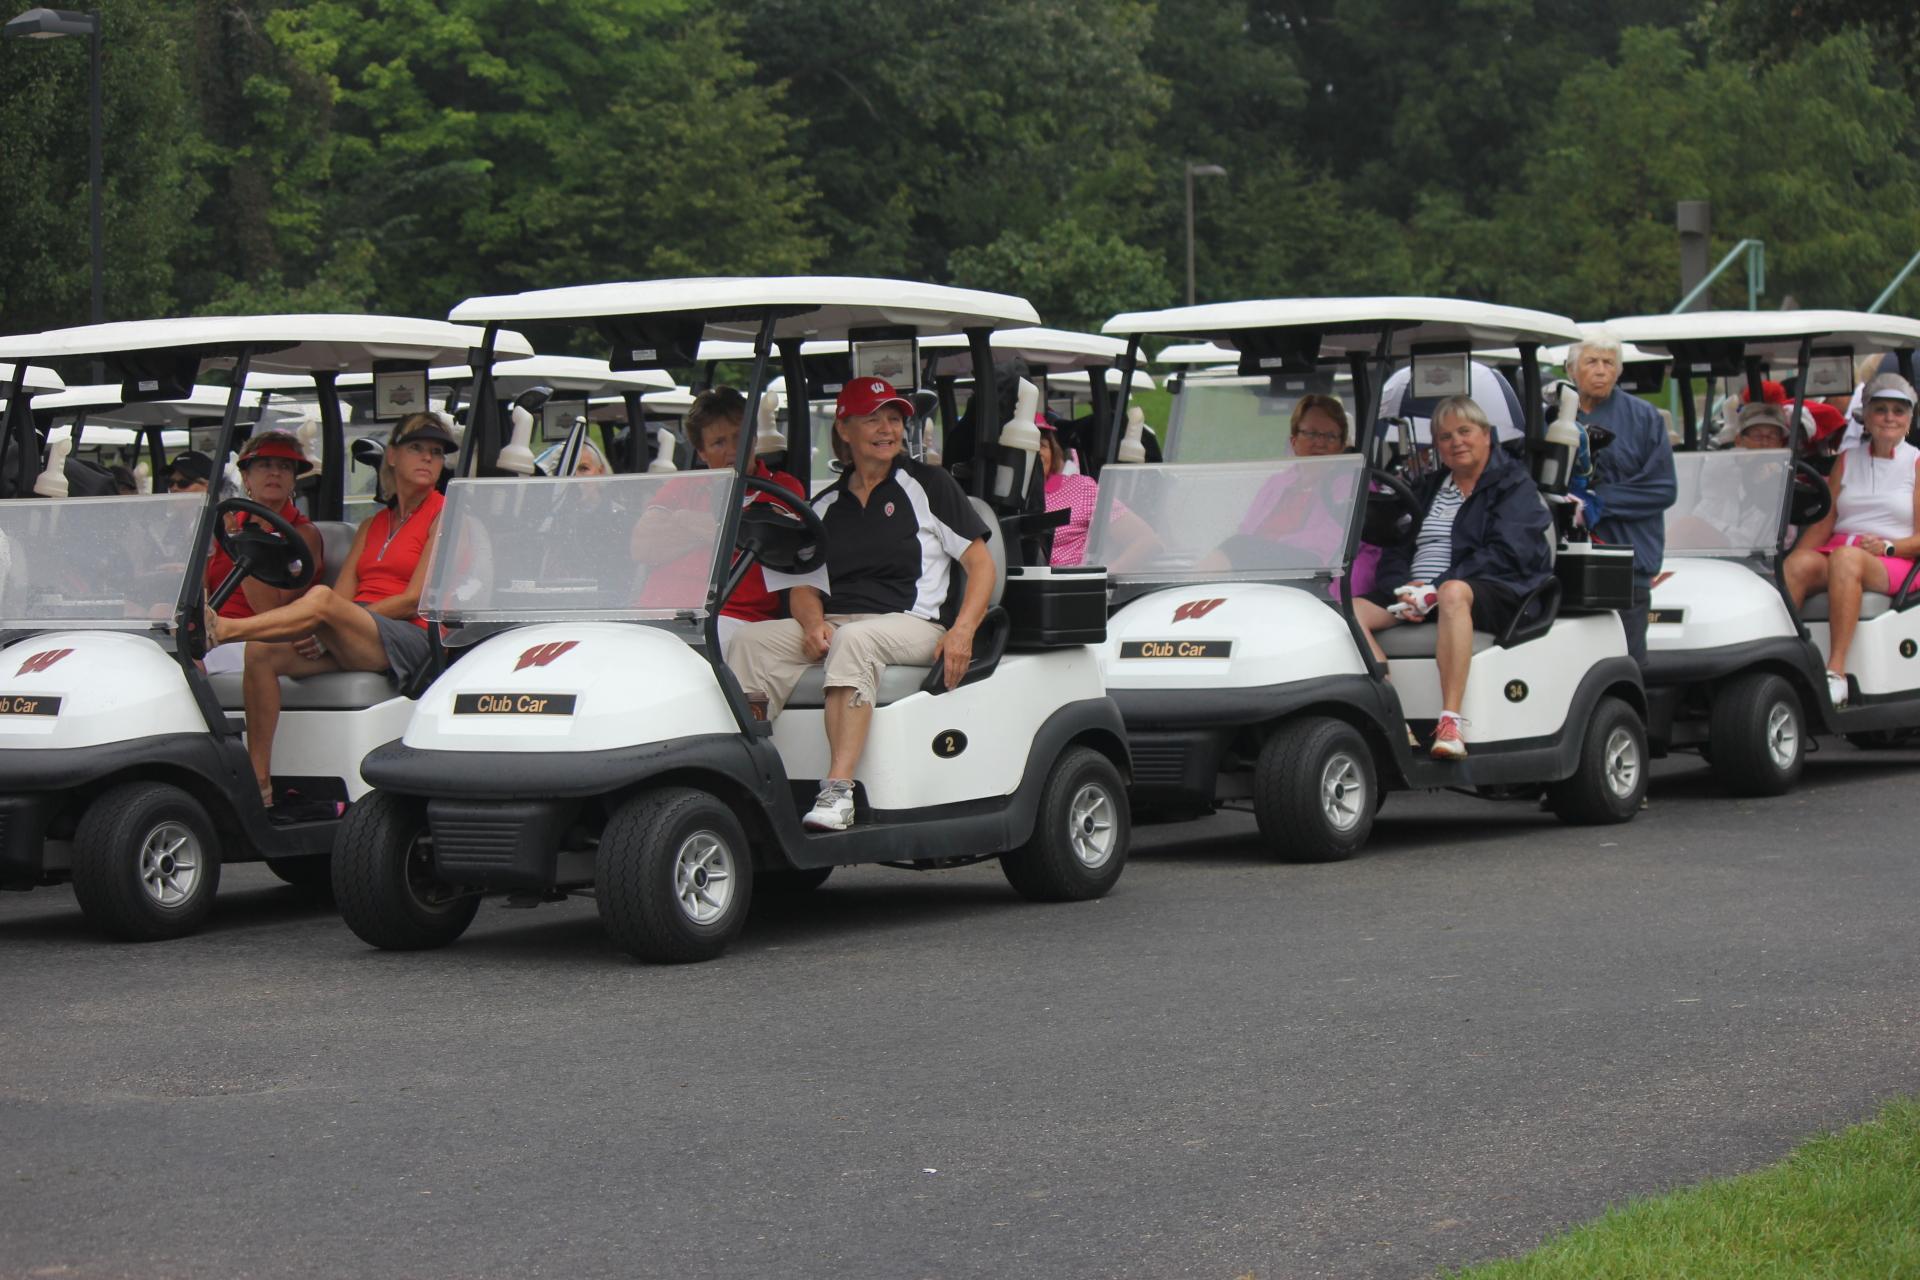 WMGA, women's golf, leagues. Madison, WI